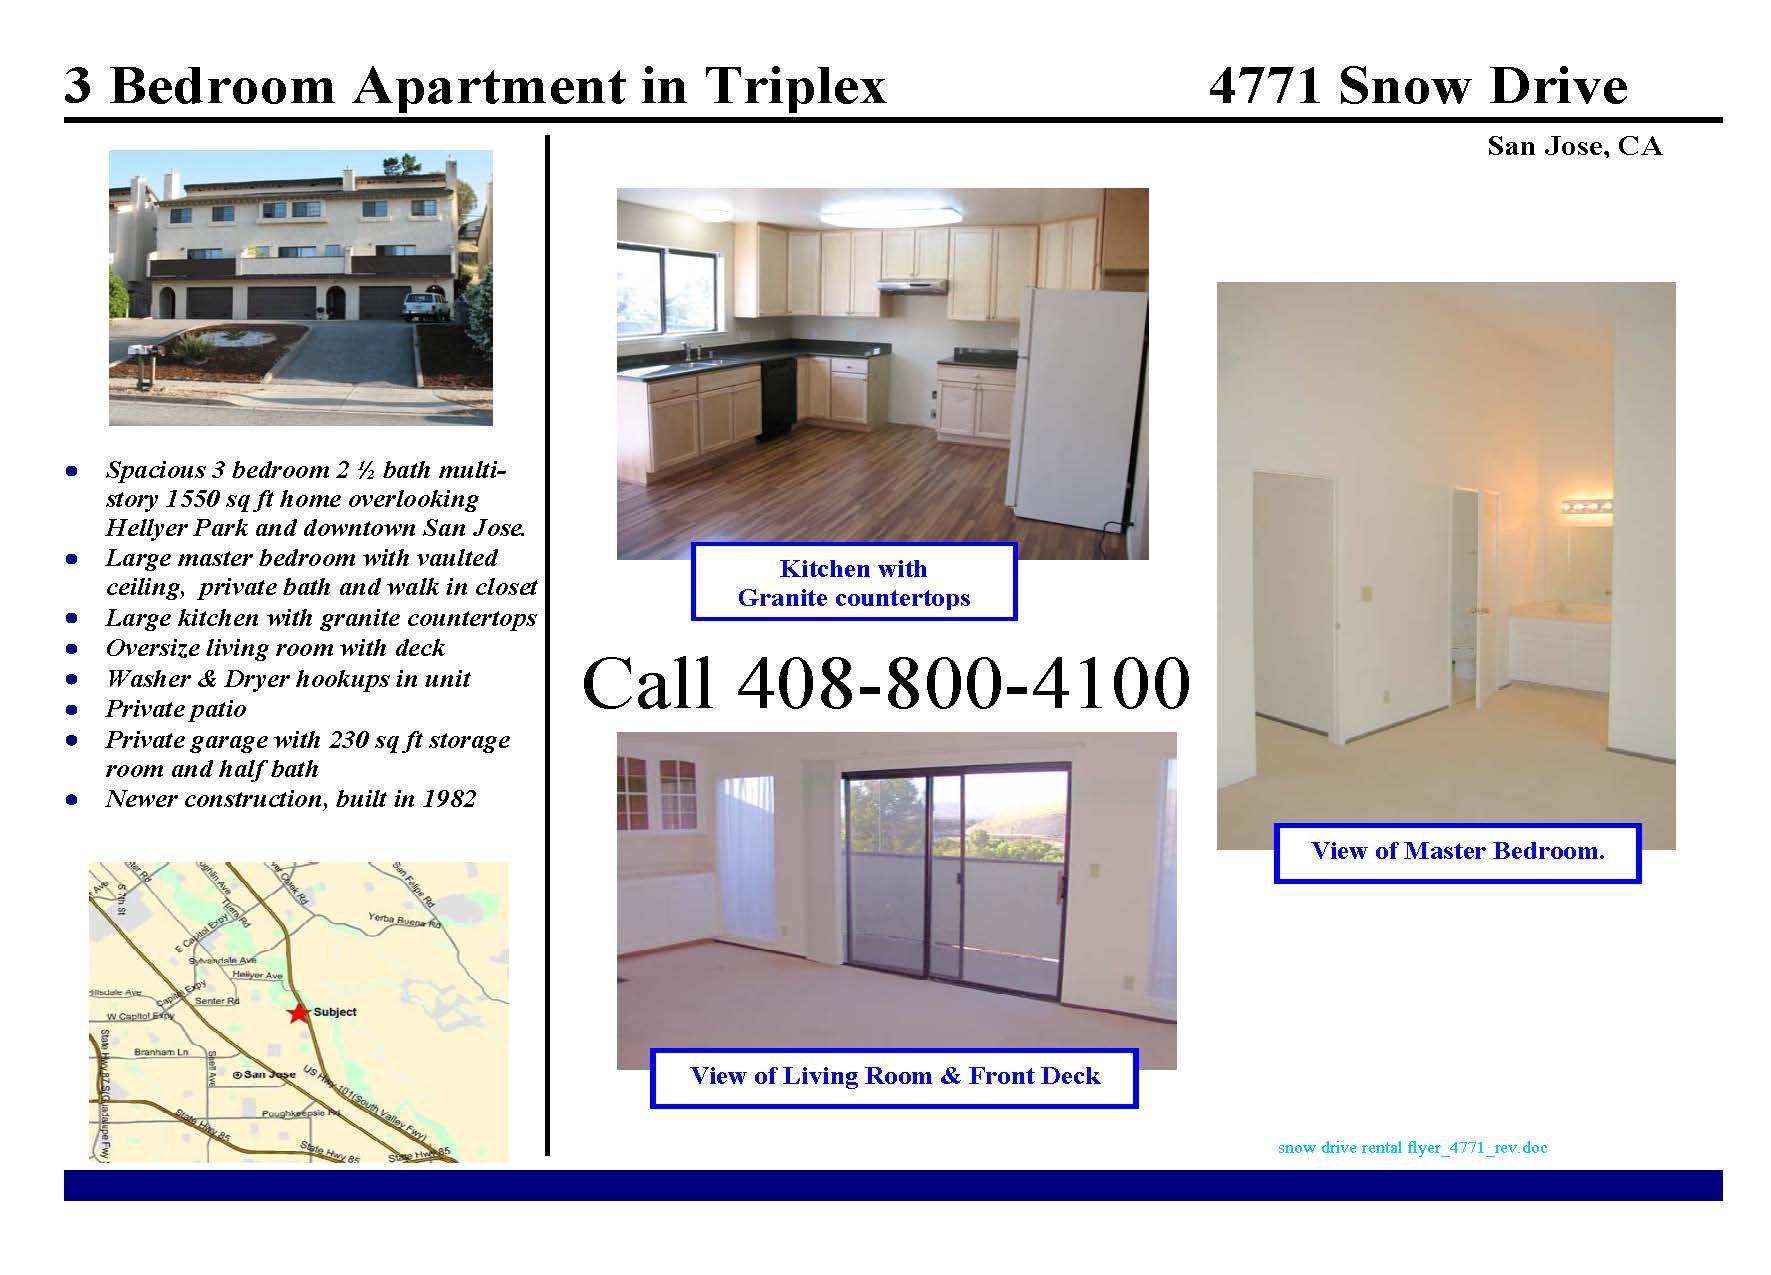 4771 Snow Dr, San Jose, CA 95111 For Rent | Trulia